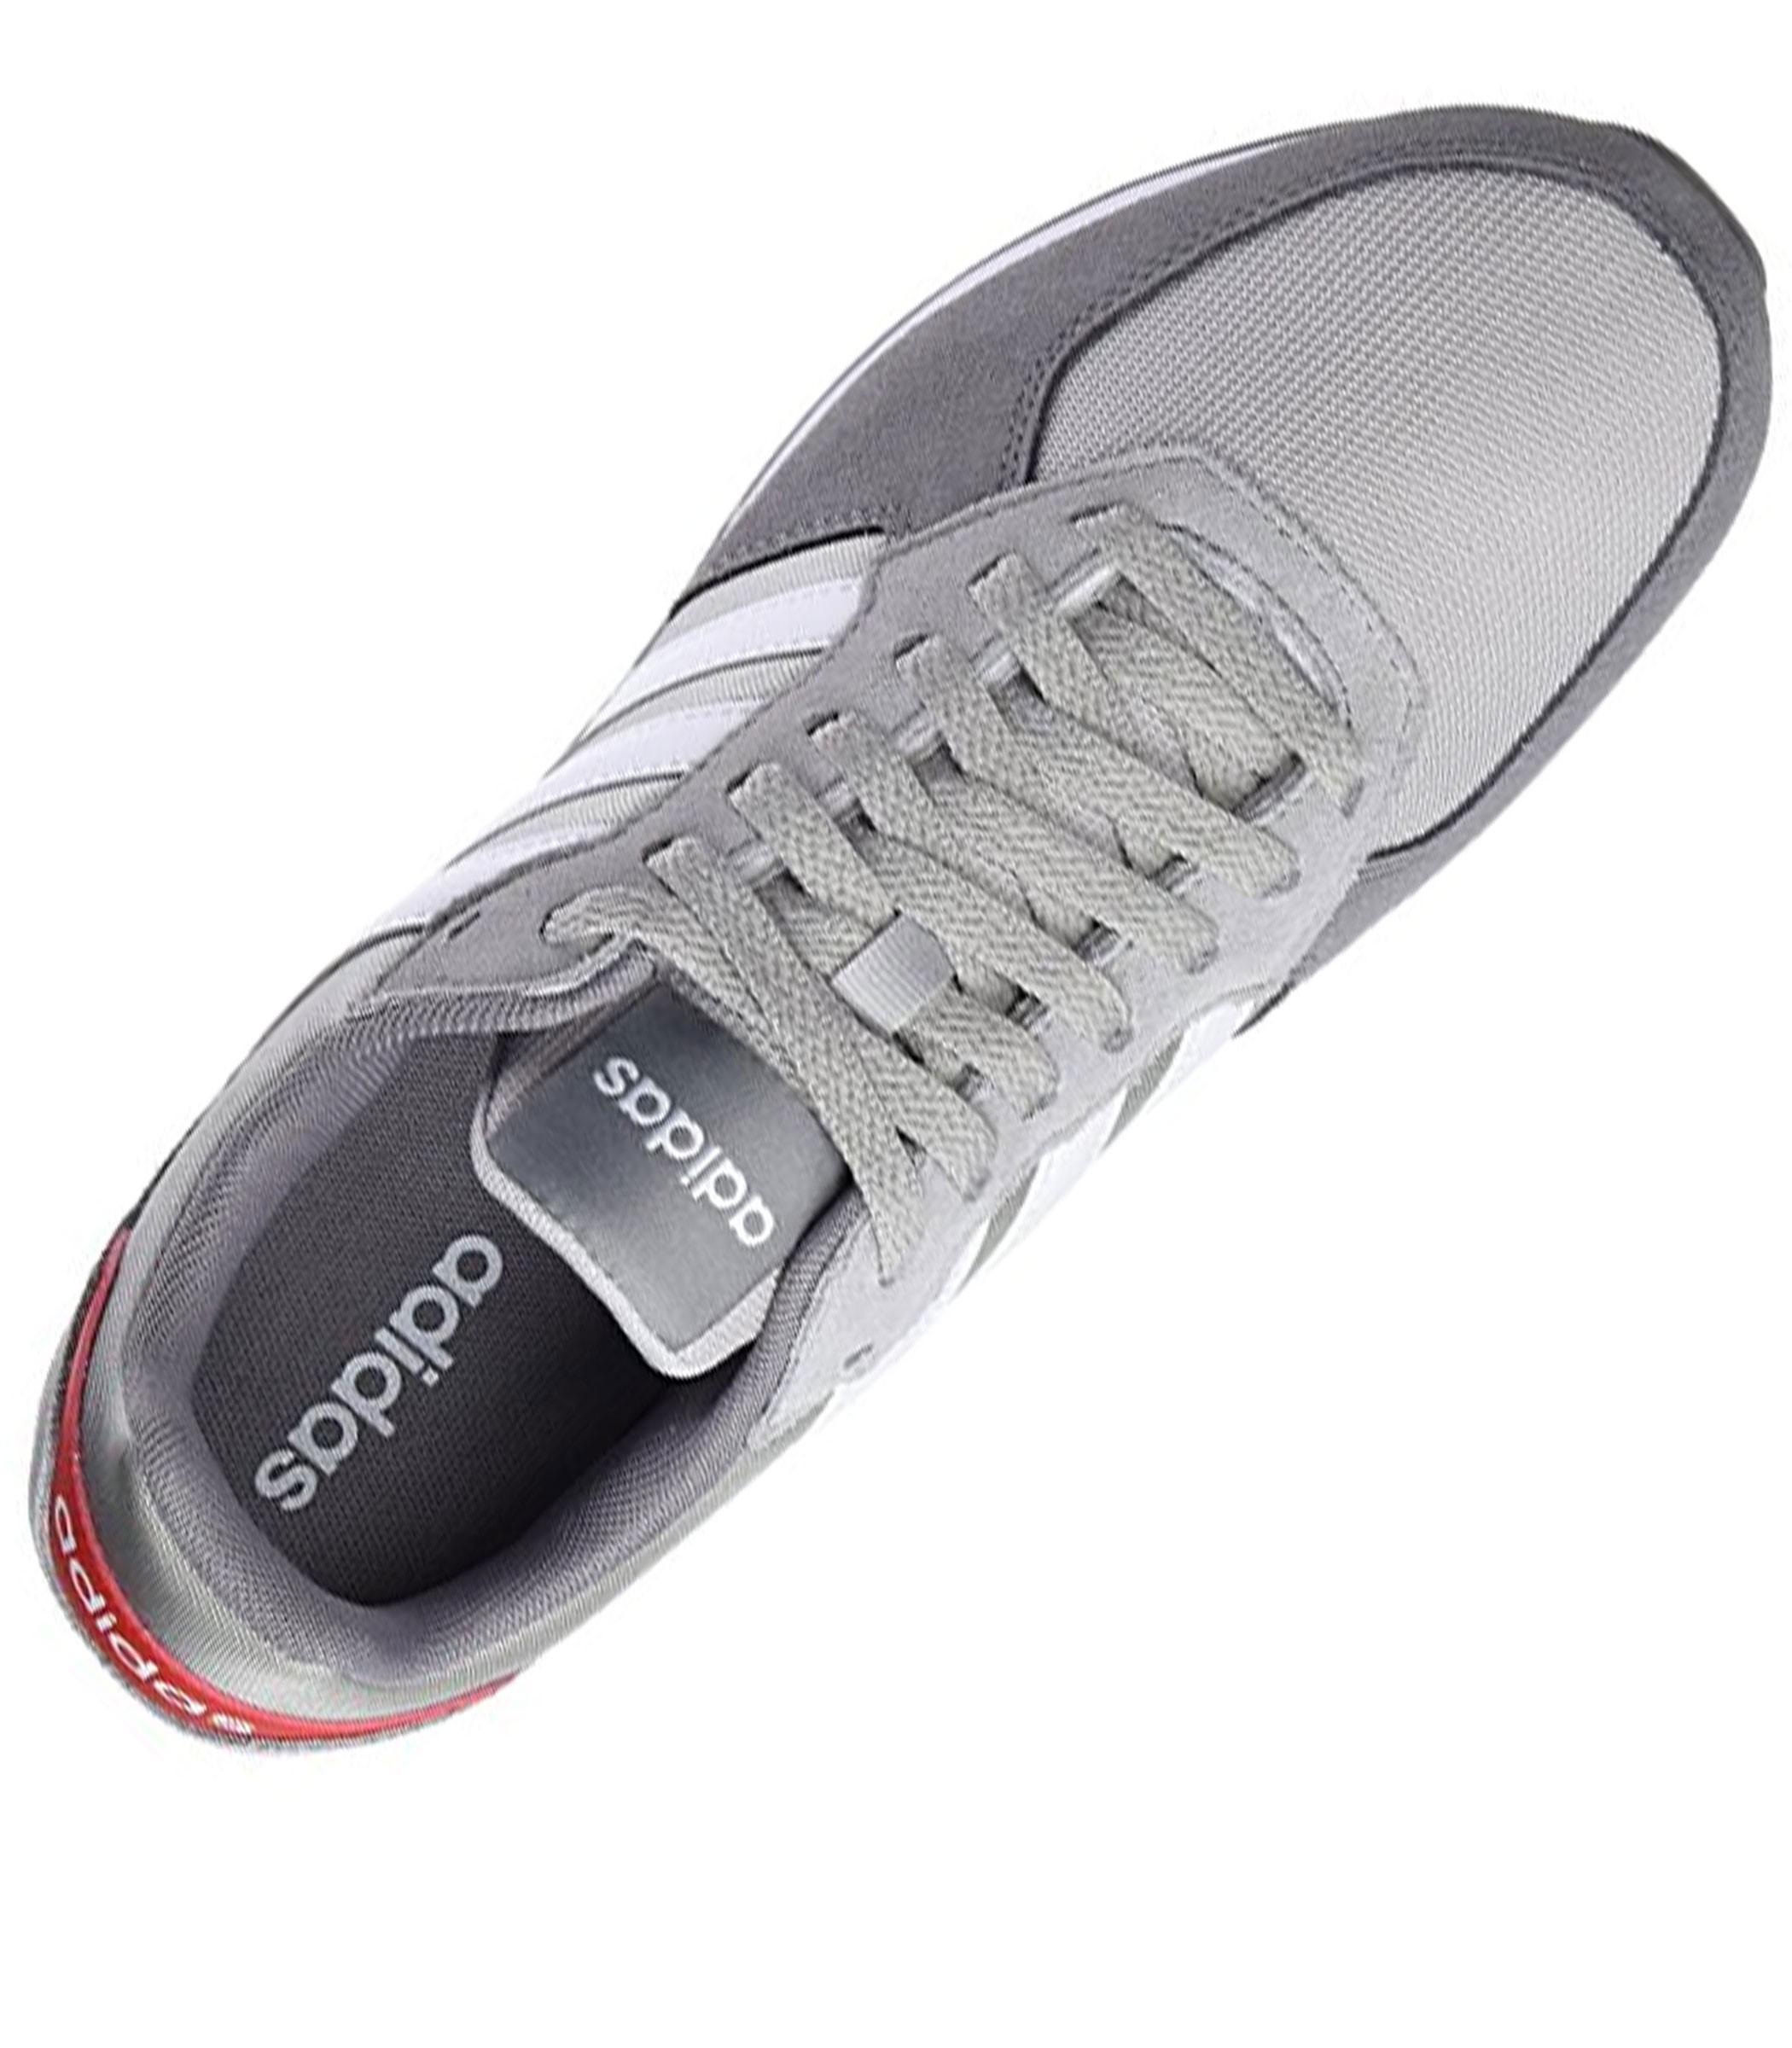 Scarpe Running Adidas 8k - Uomo rif. DB1730 a9287f236aa